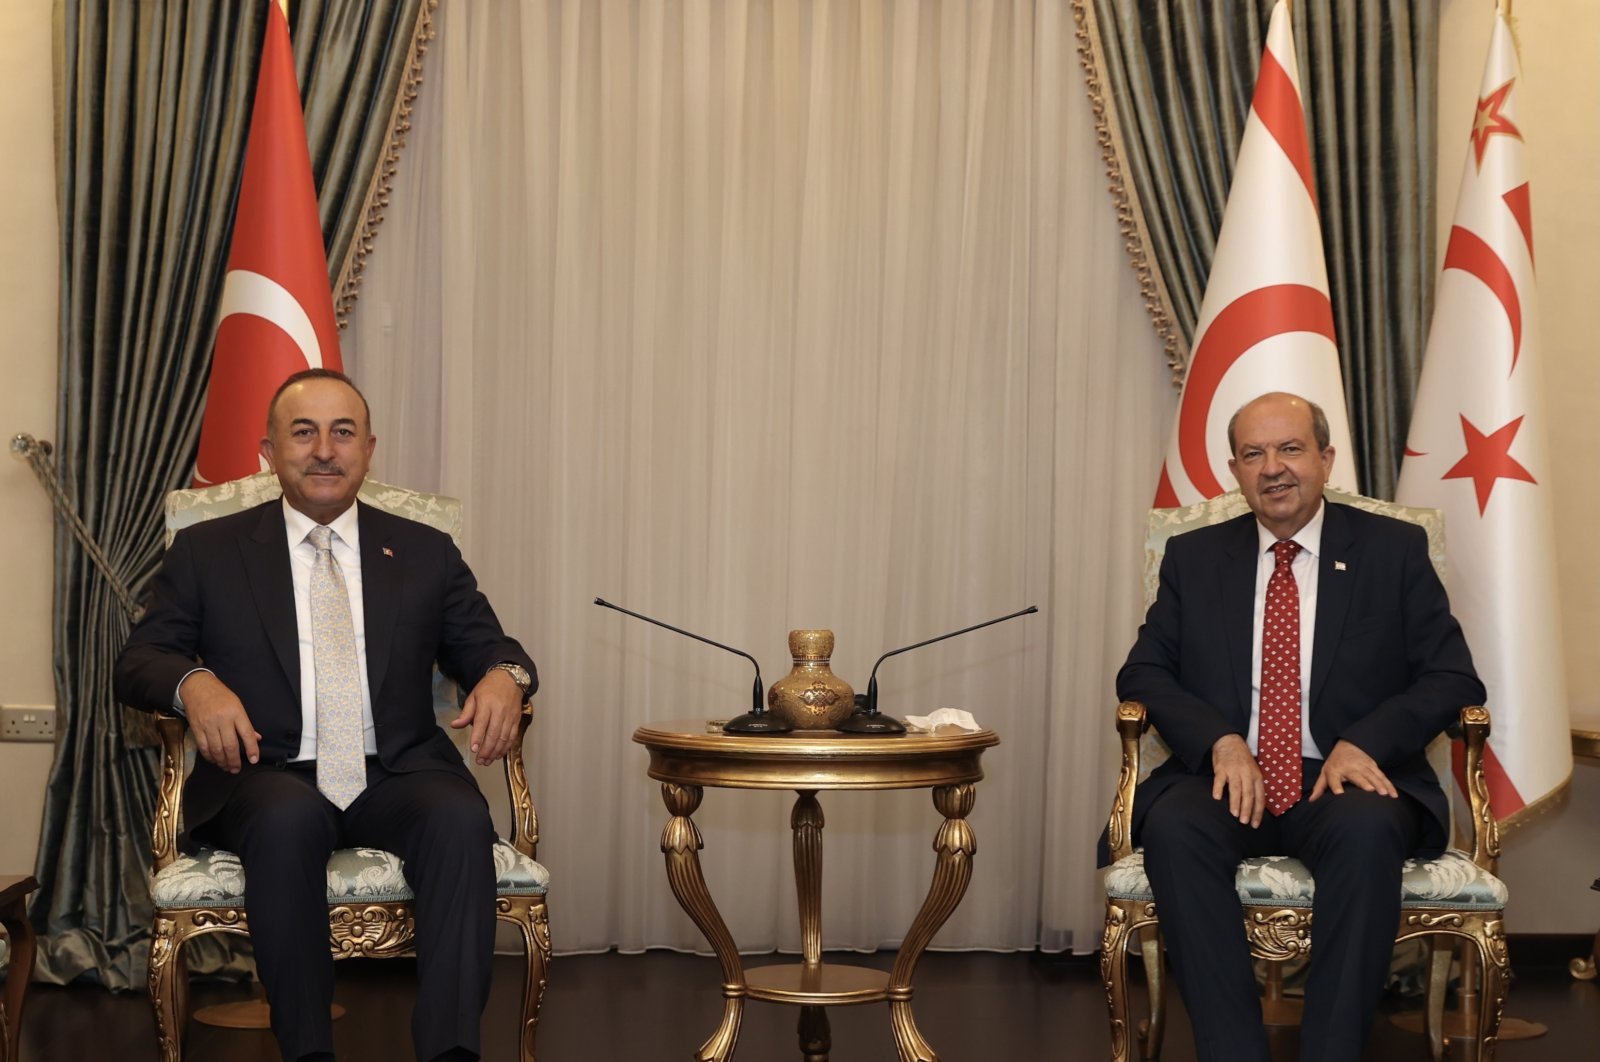 Turkey's Foreign Minister Mevlüt Çavuşoğlu (L) and TRNC President Ersin Tatar meet in Lefkoşa (Nicosia), TRNC, July 1, 2021. (AA Photo)